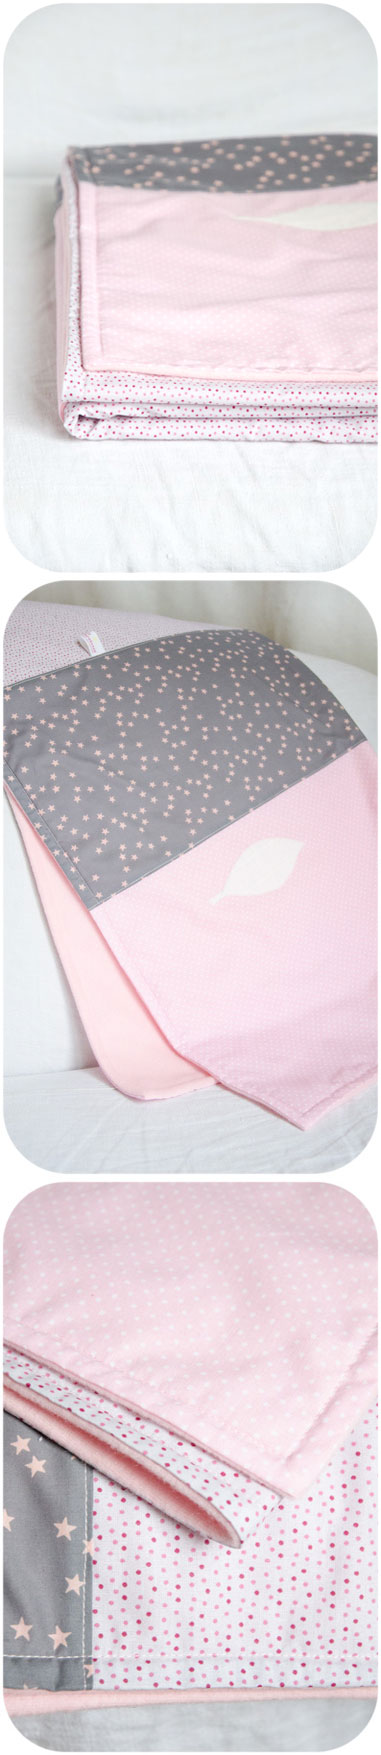 couverture-bebe-rose1